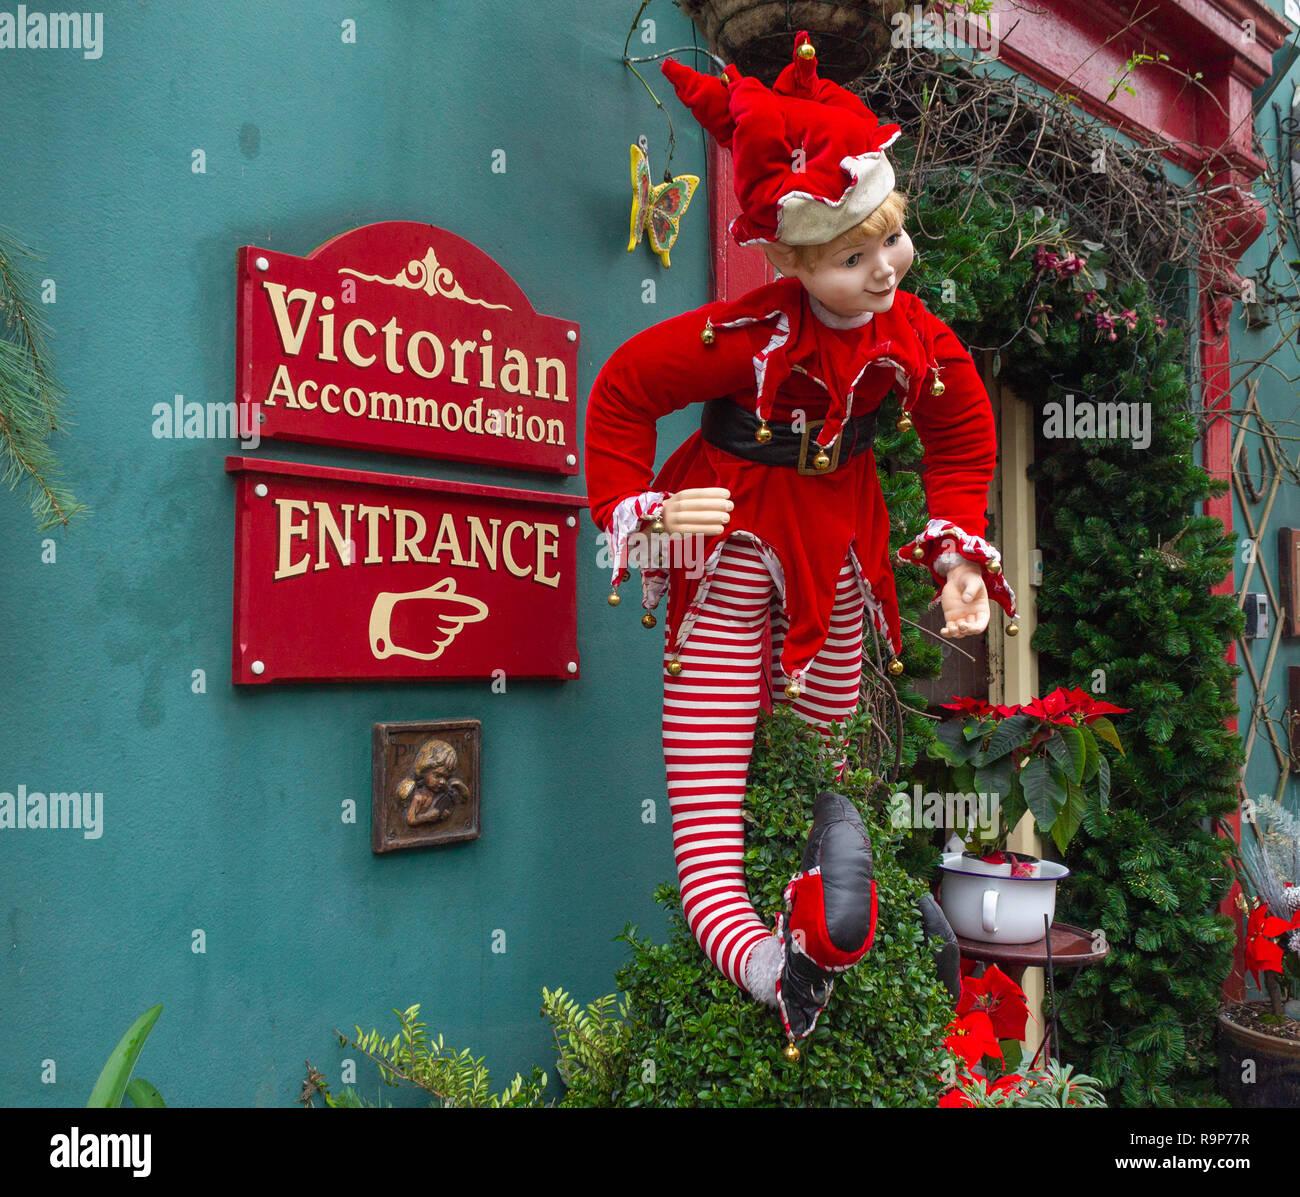 christmas-elf-decoration-on-guest-house-entrance-R9P77R.jpg